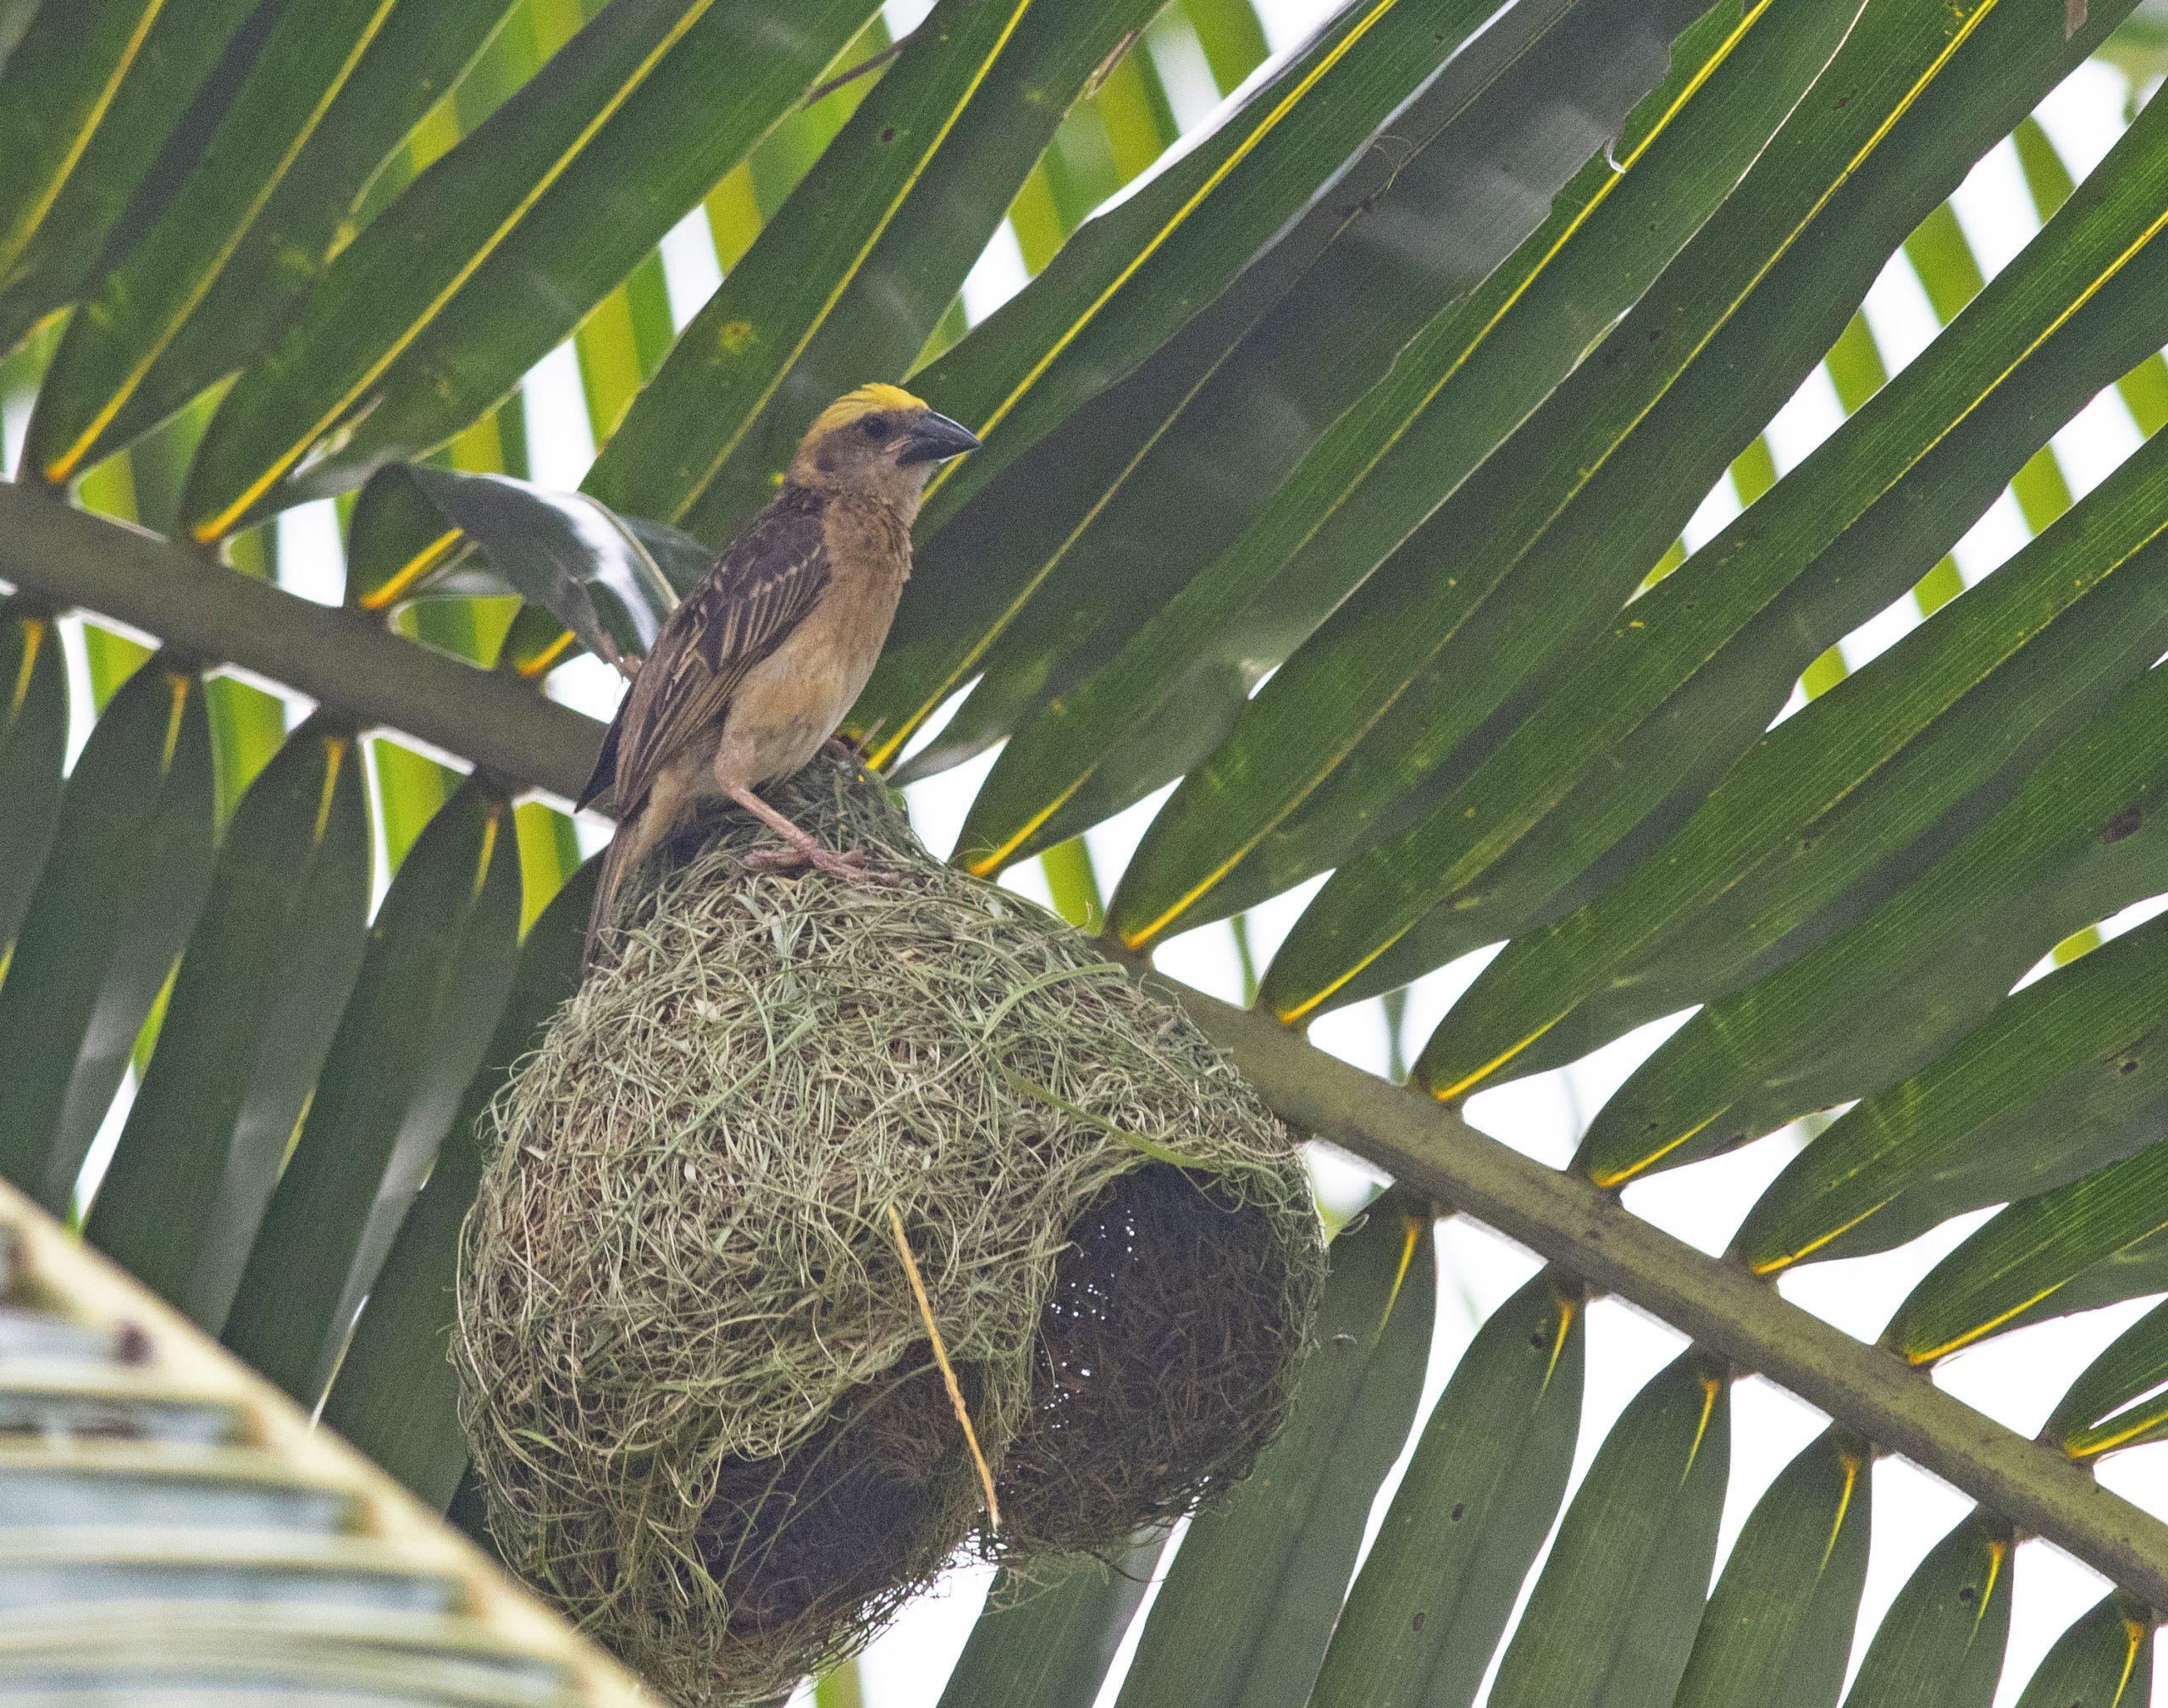 Baya weaver Bird on its nest